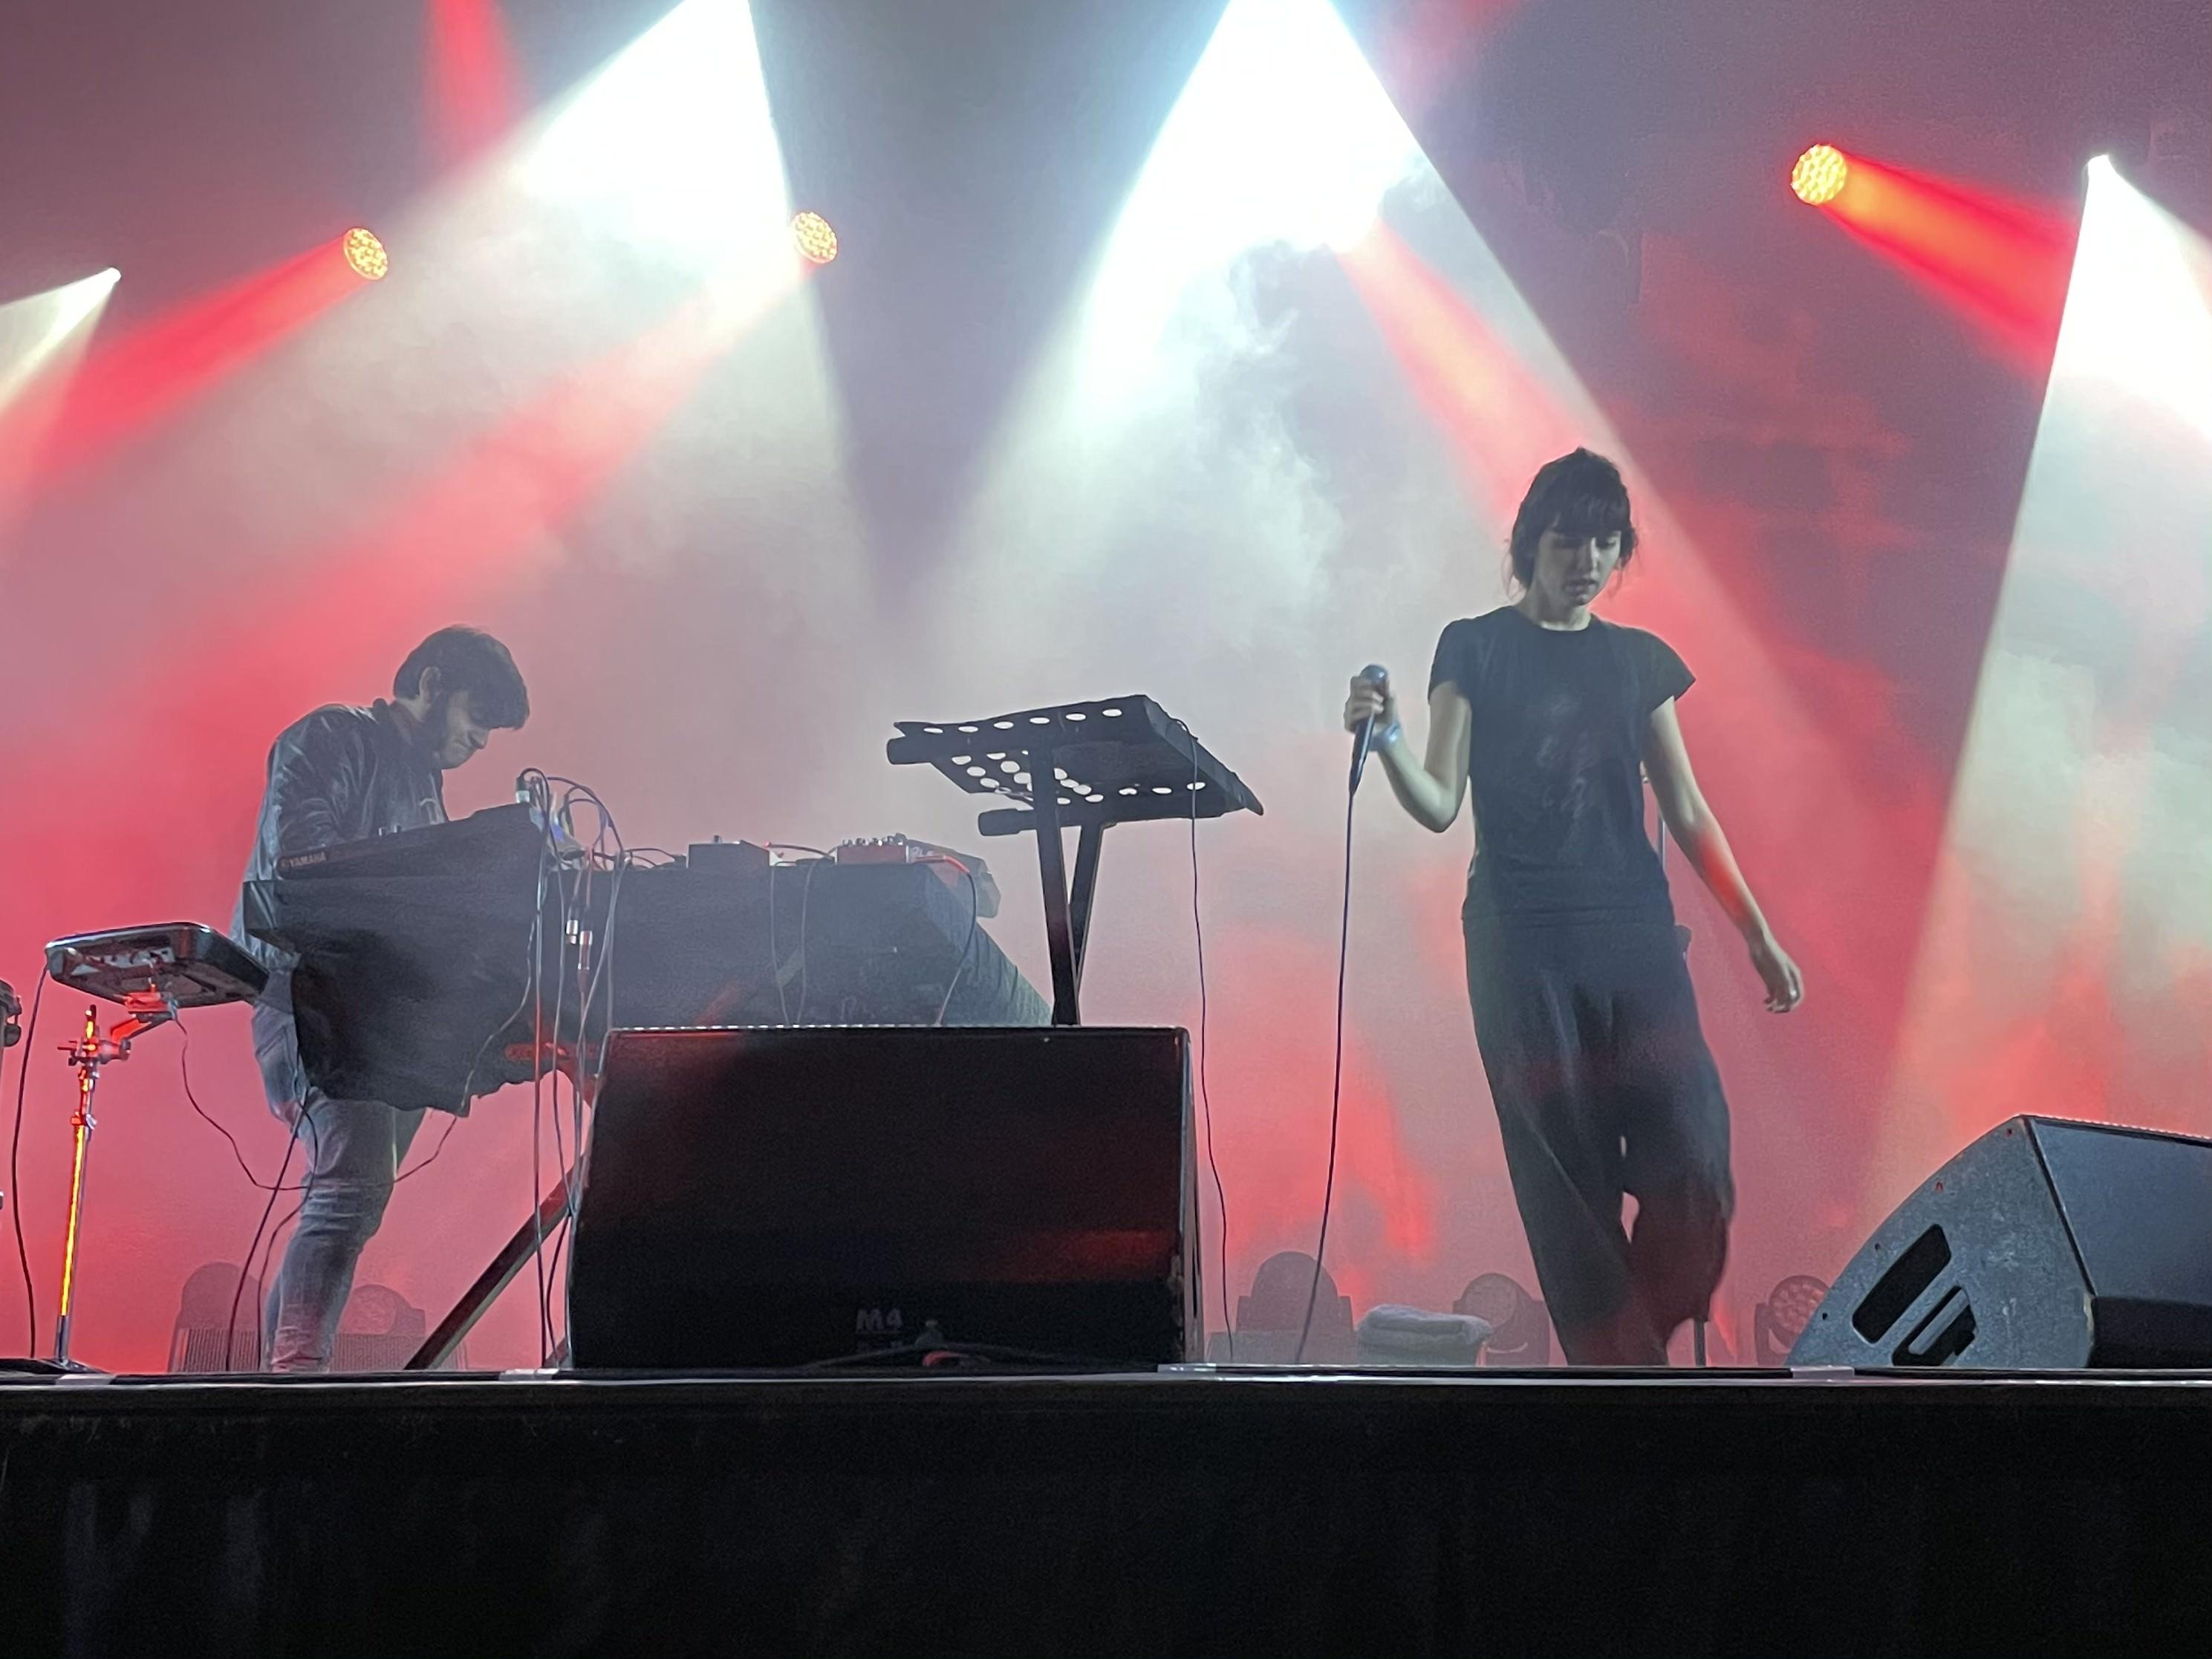 Dame_Area_-_Festival_Levitation_France_24_09_2021_(2)